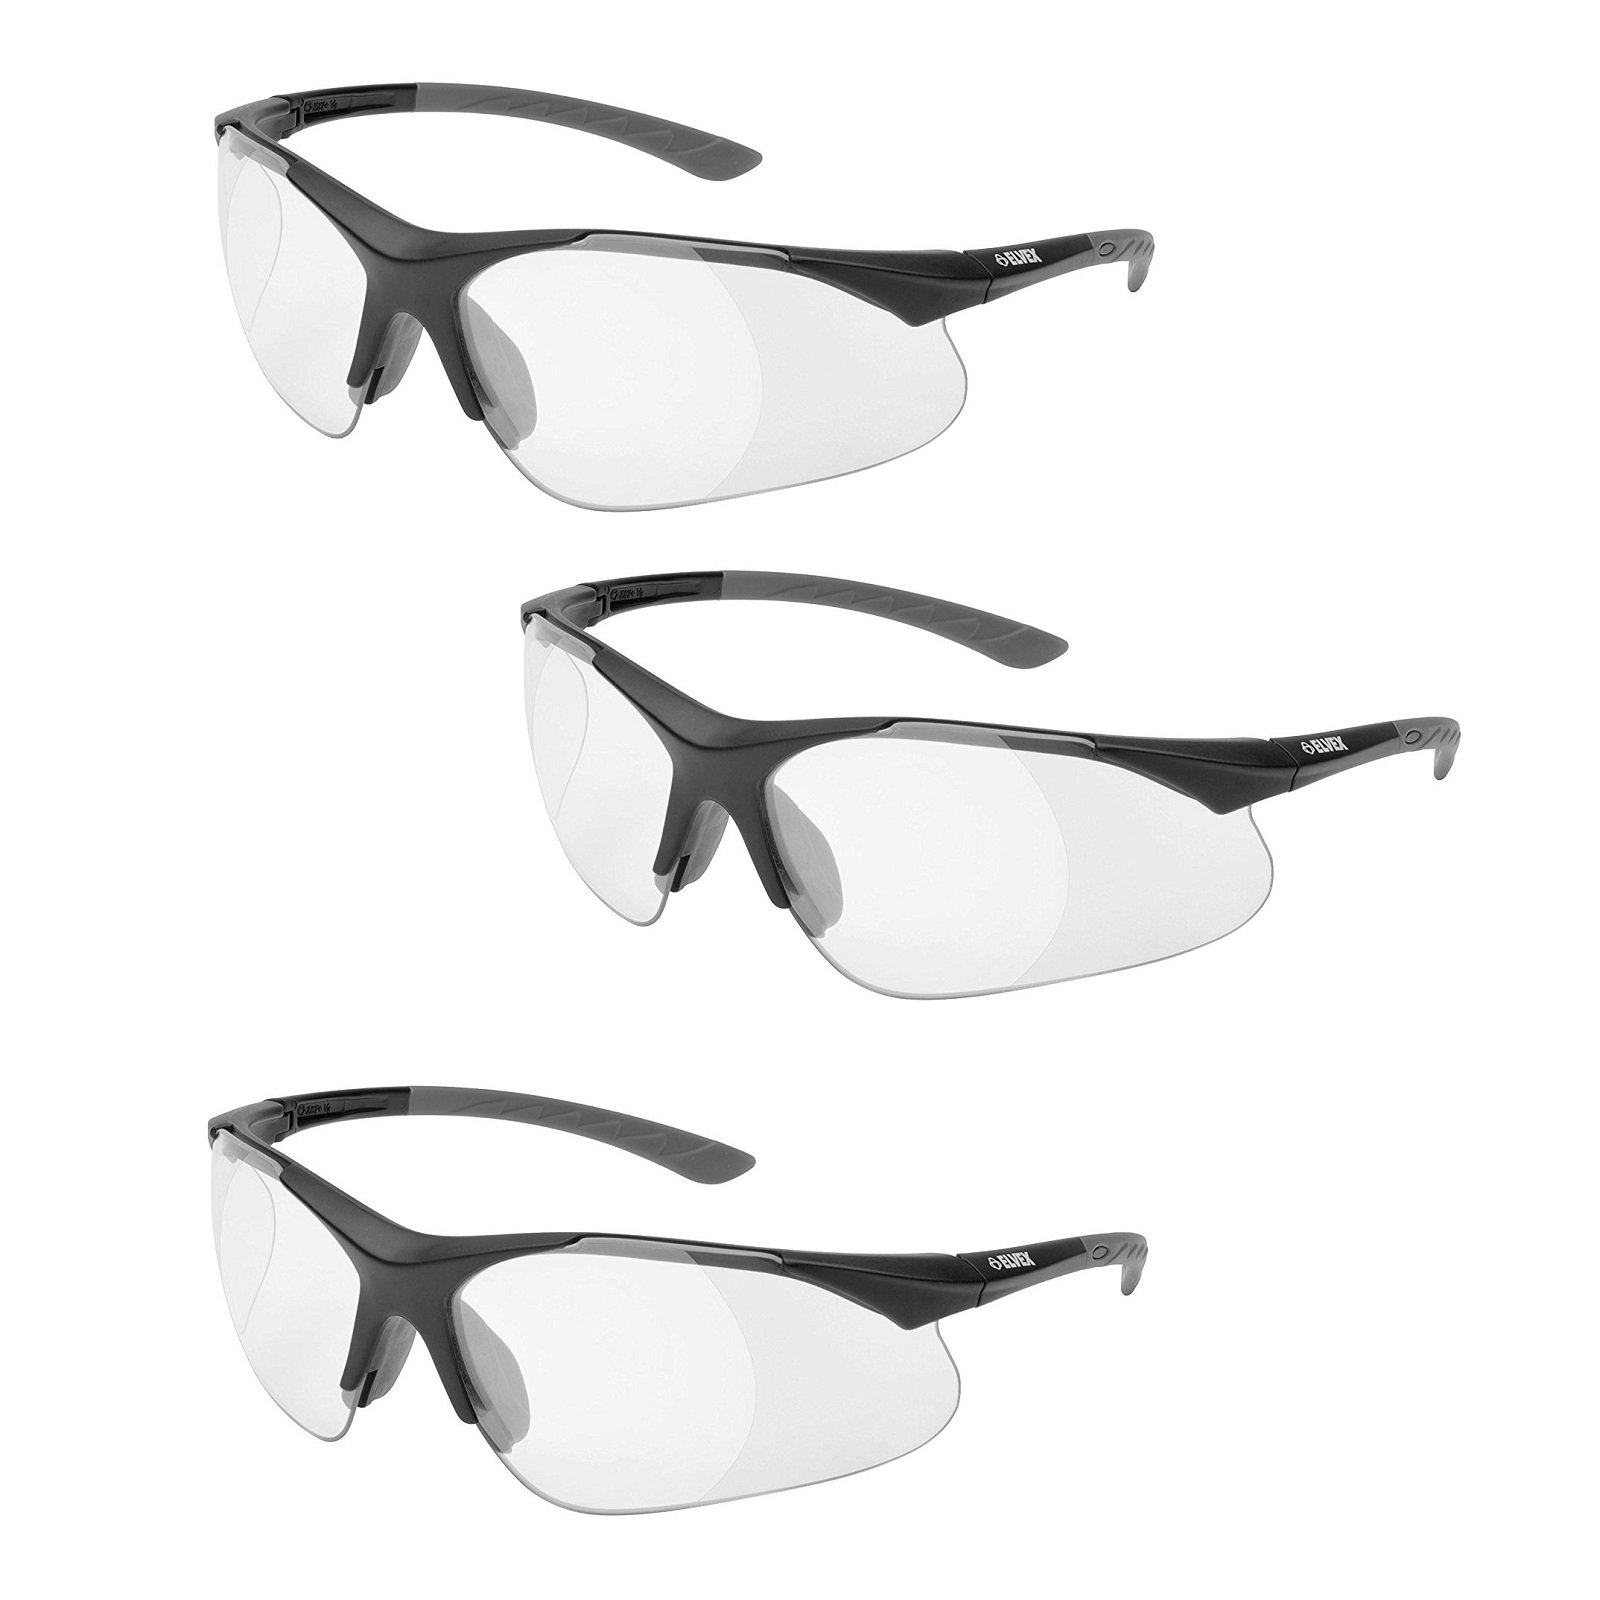 Elvex RX-500C Full Lens Magnifier, Black Frame/Grey Temple Tips (3 Pair) (2.5 Lens)